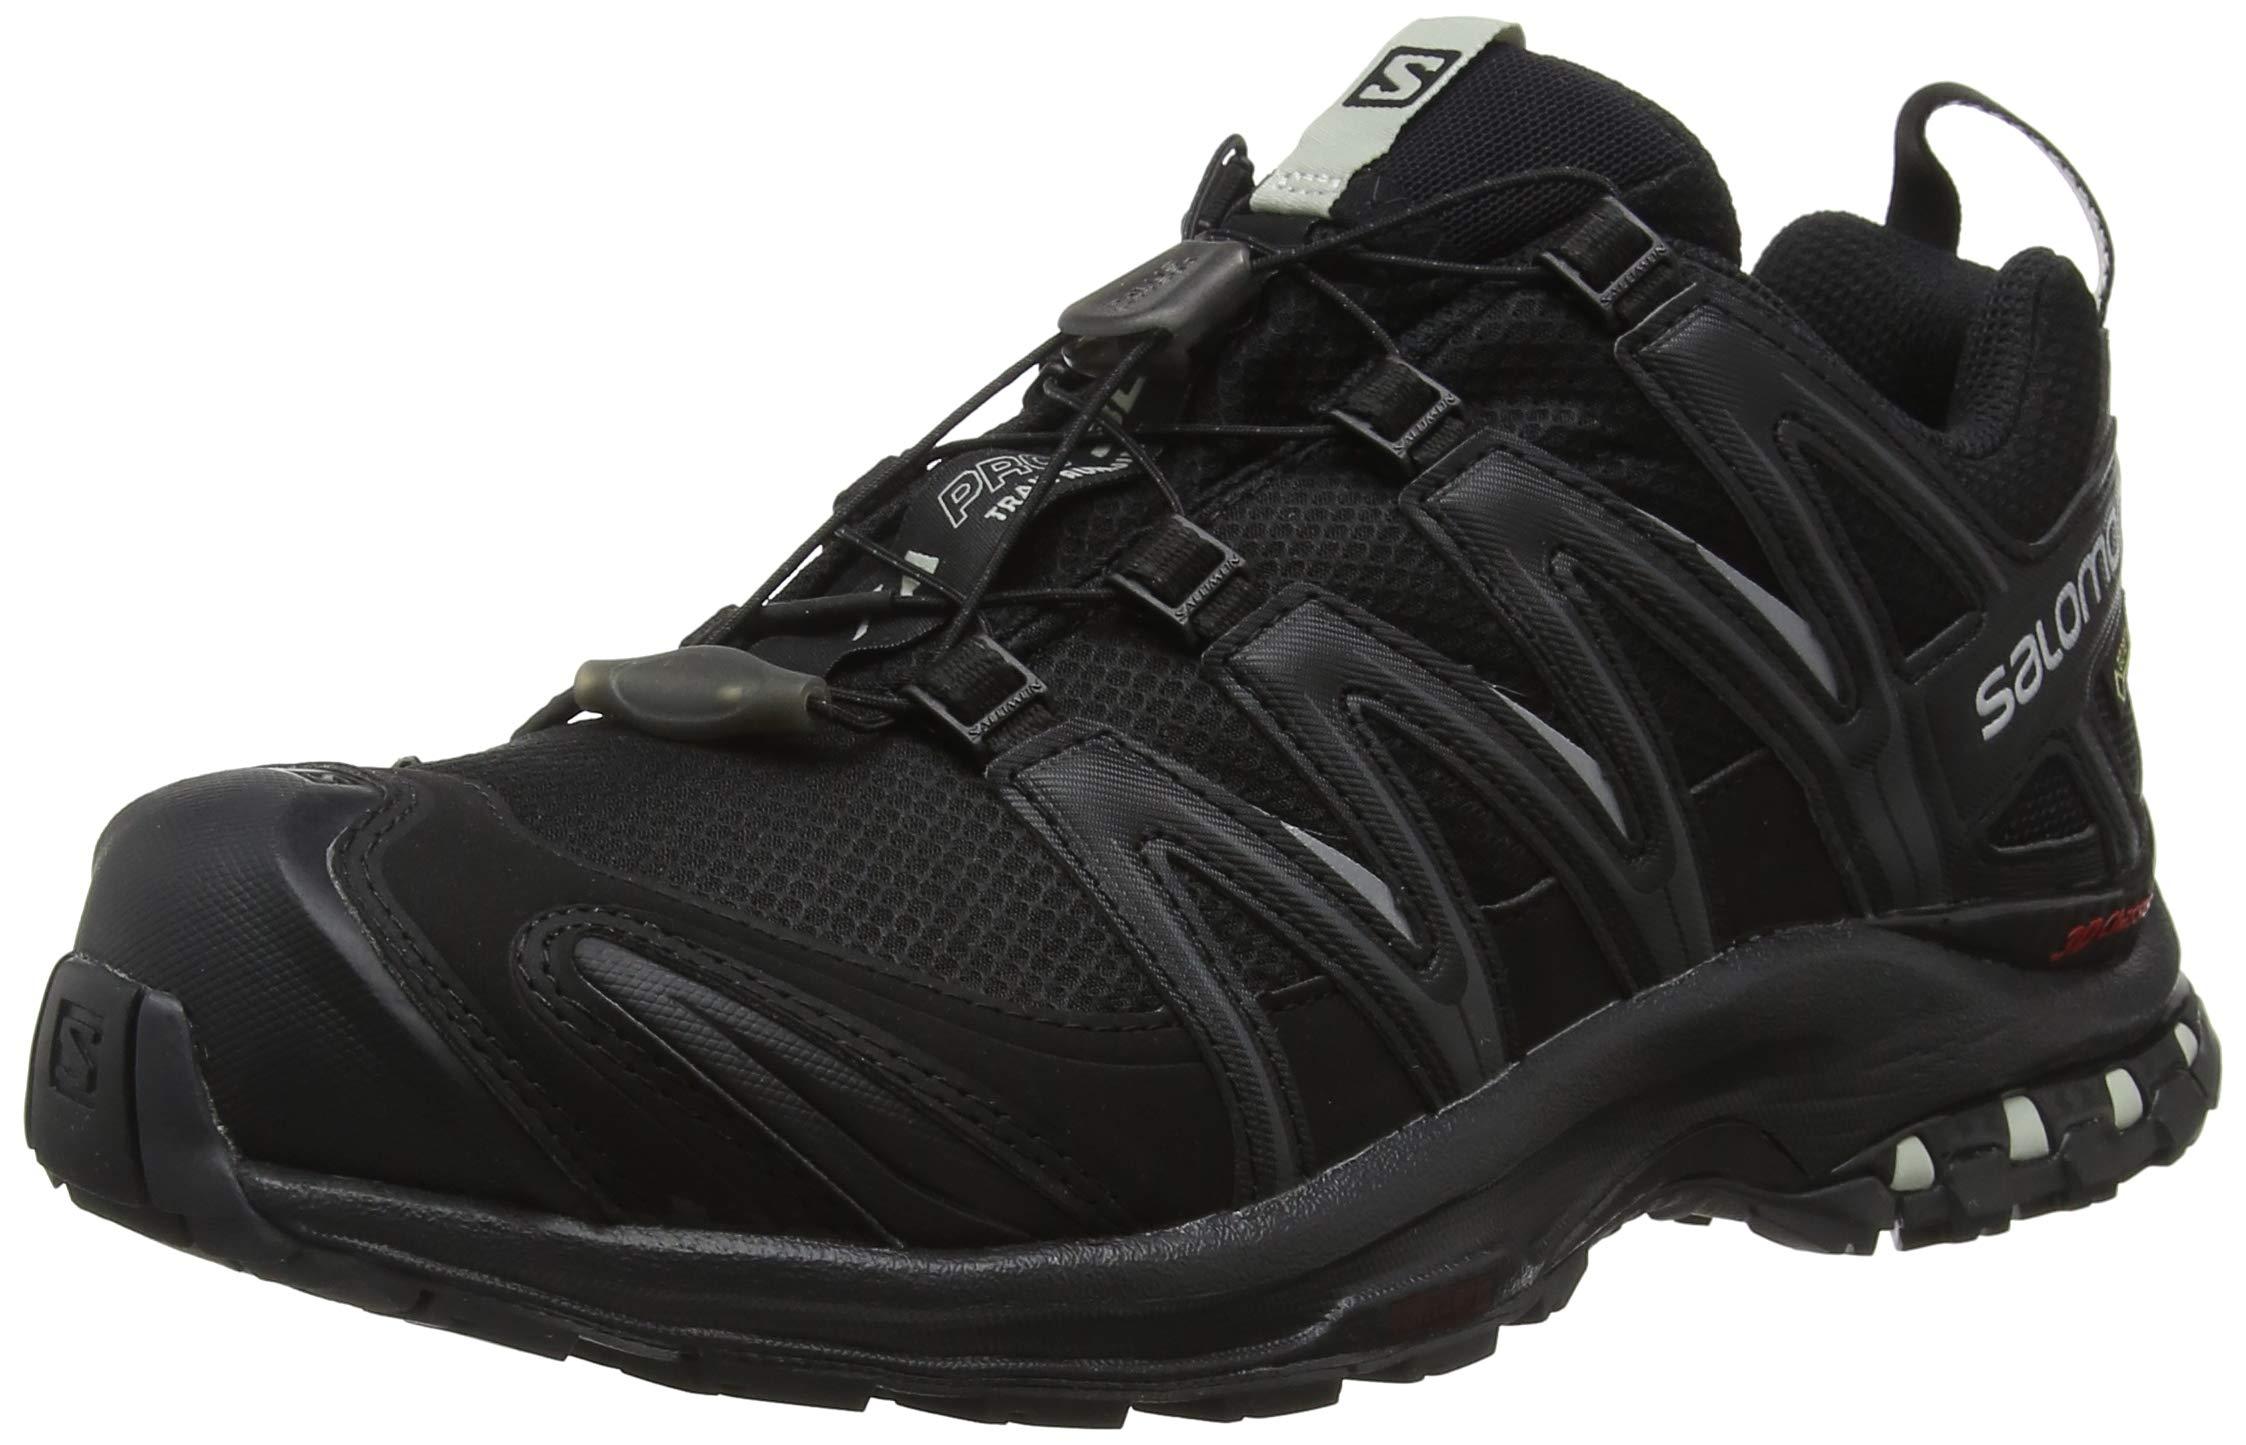 scarpa salomon per pronatori